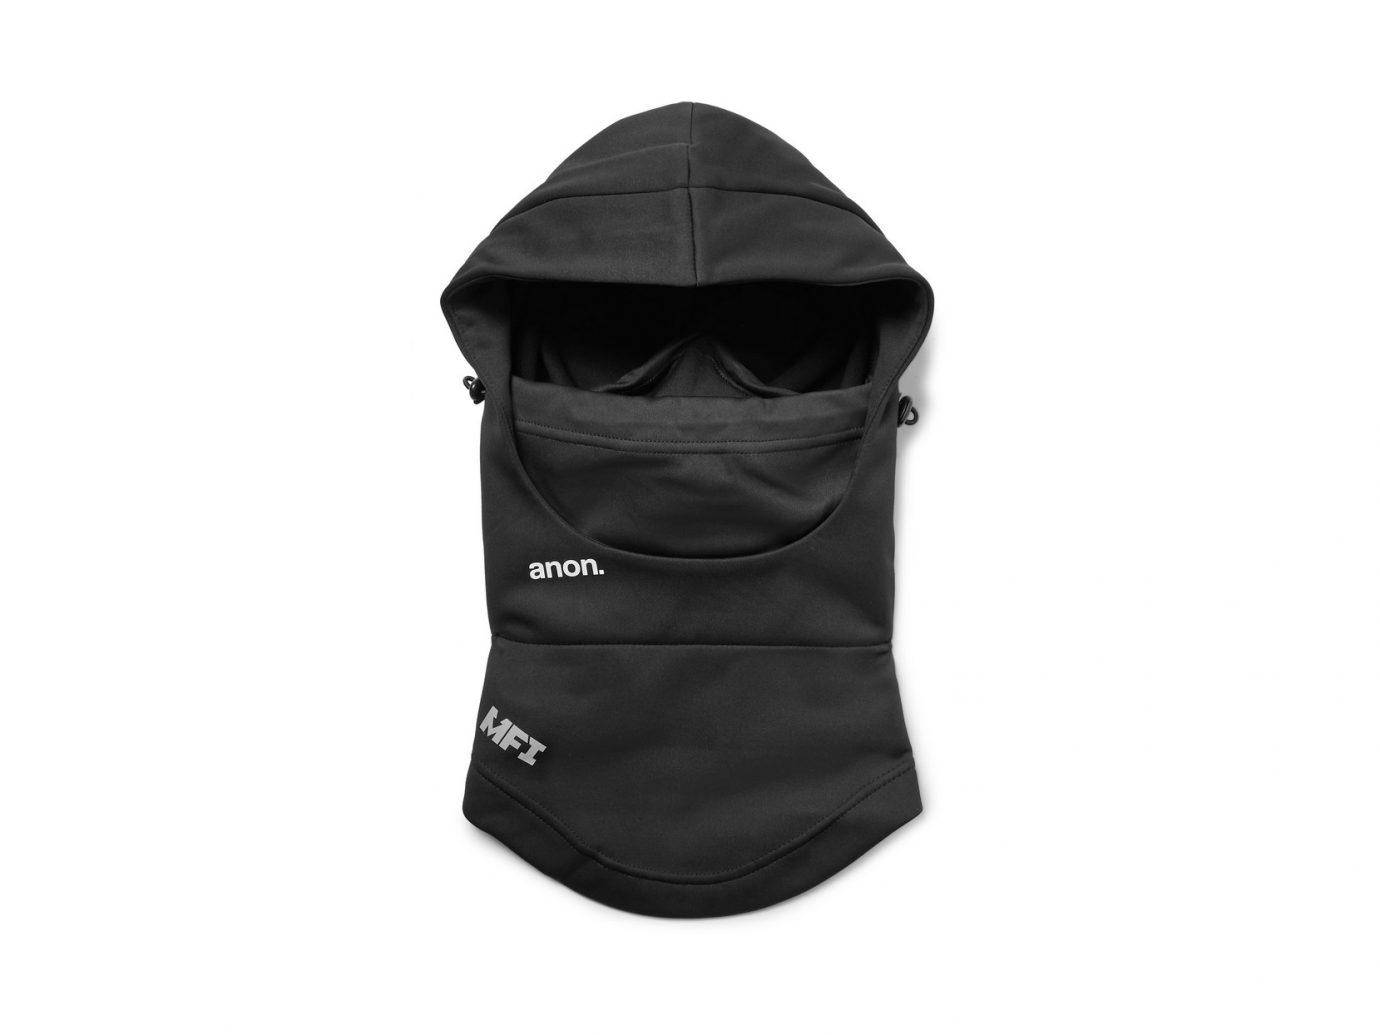 ANON MFI Goggle-Compatible Hooded Balaclava